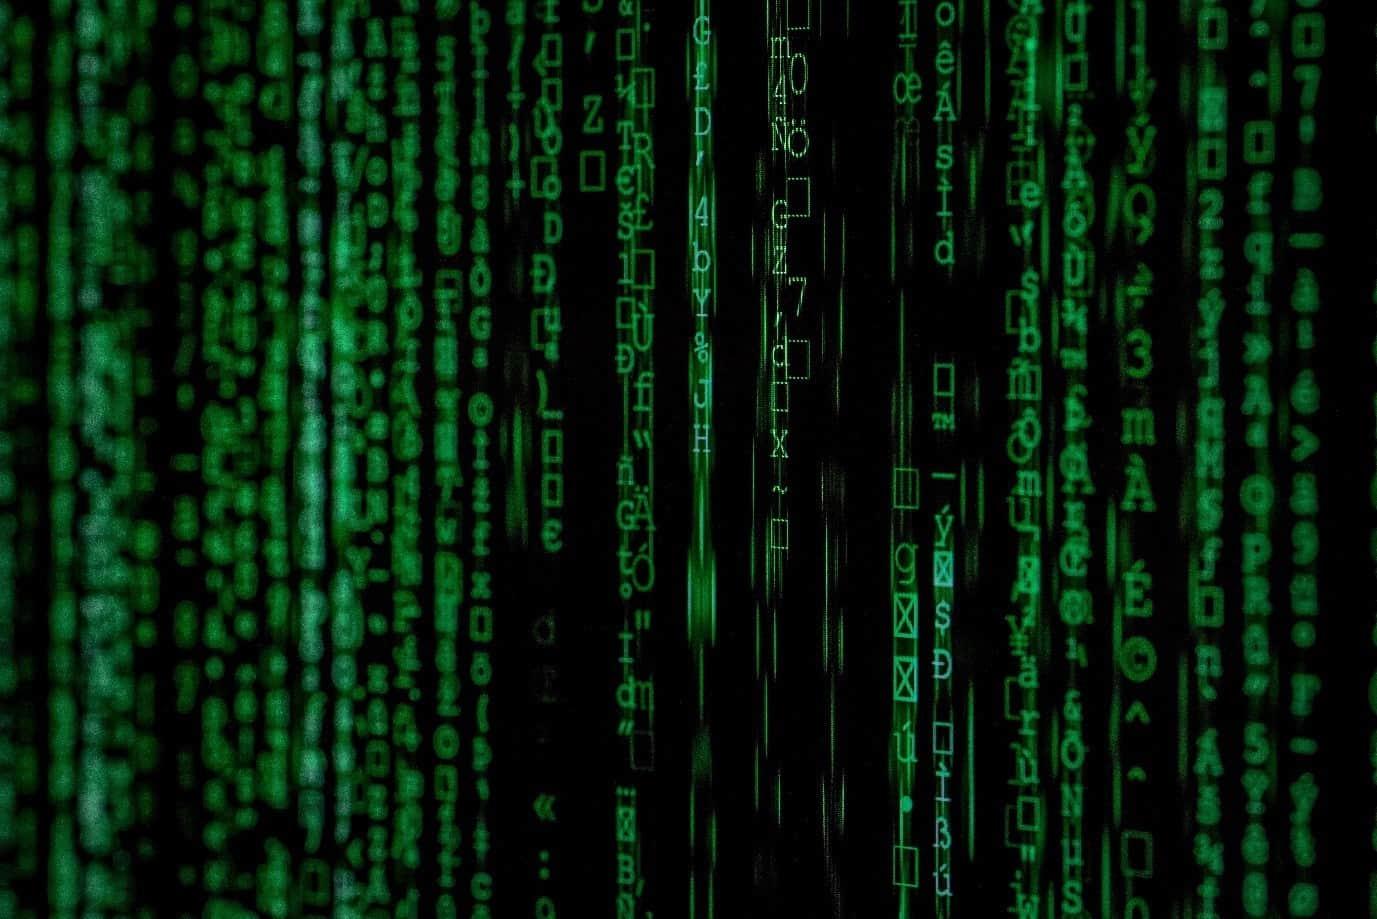 Machine learning nella cybersecurity